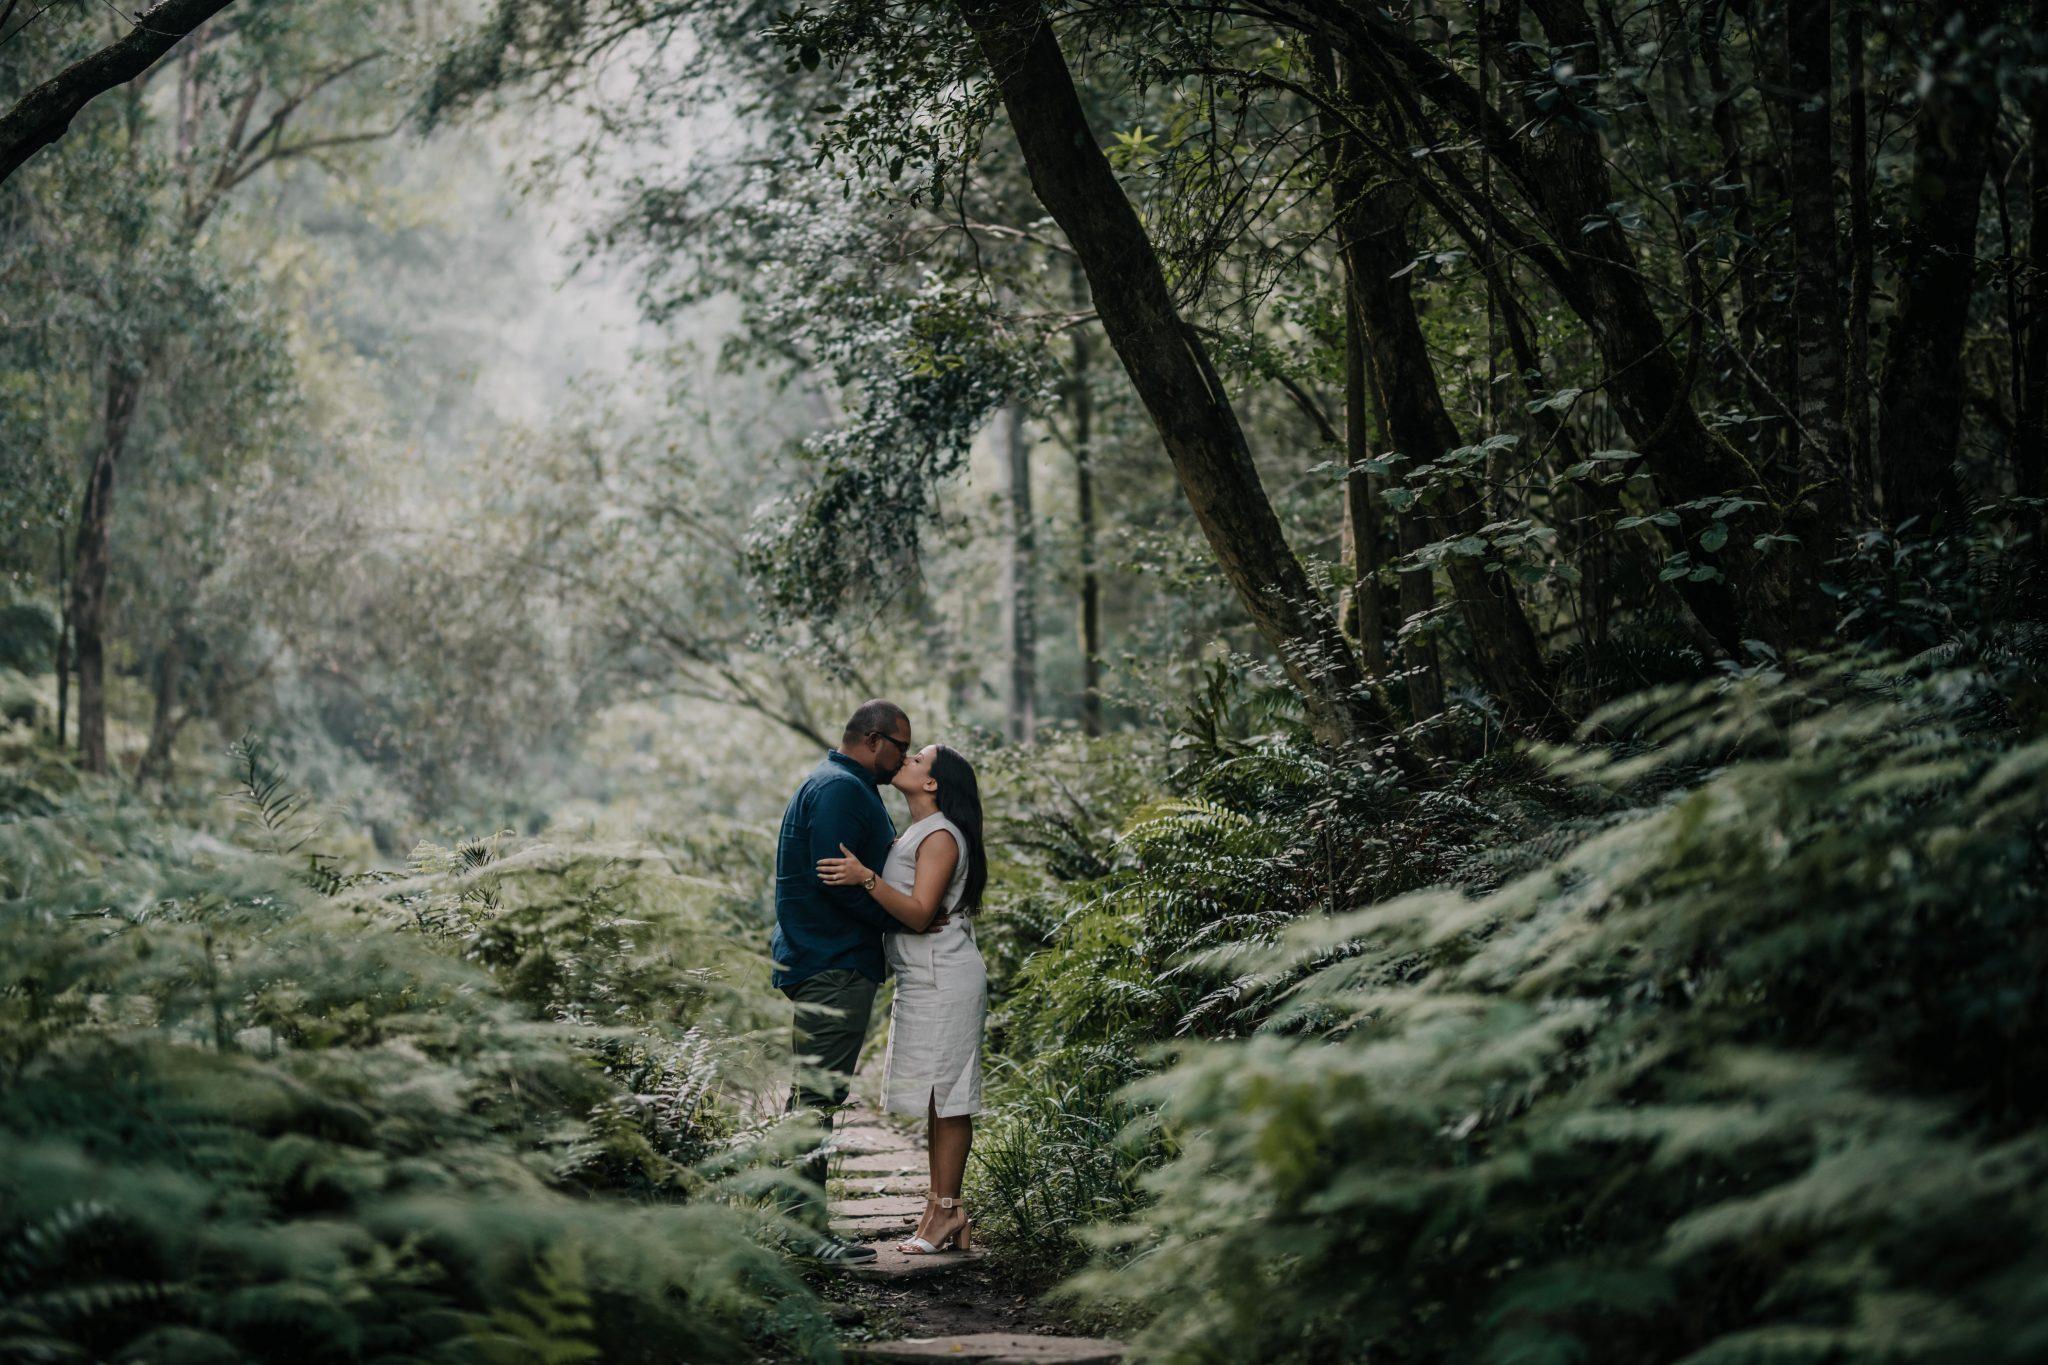 amy-blaine-jubilee-creek-engagement-shoot-23